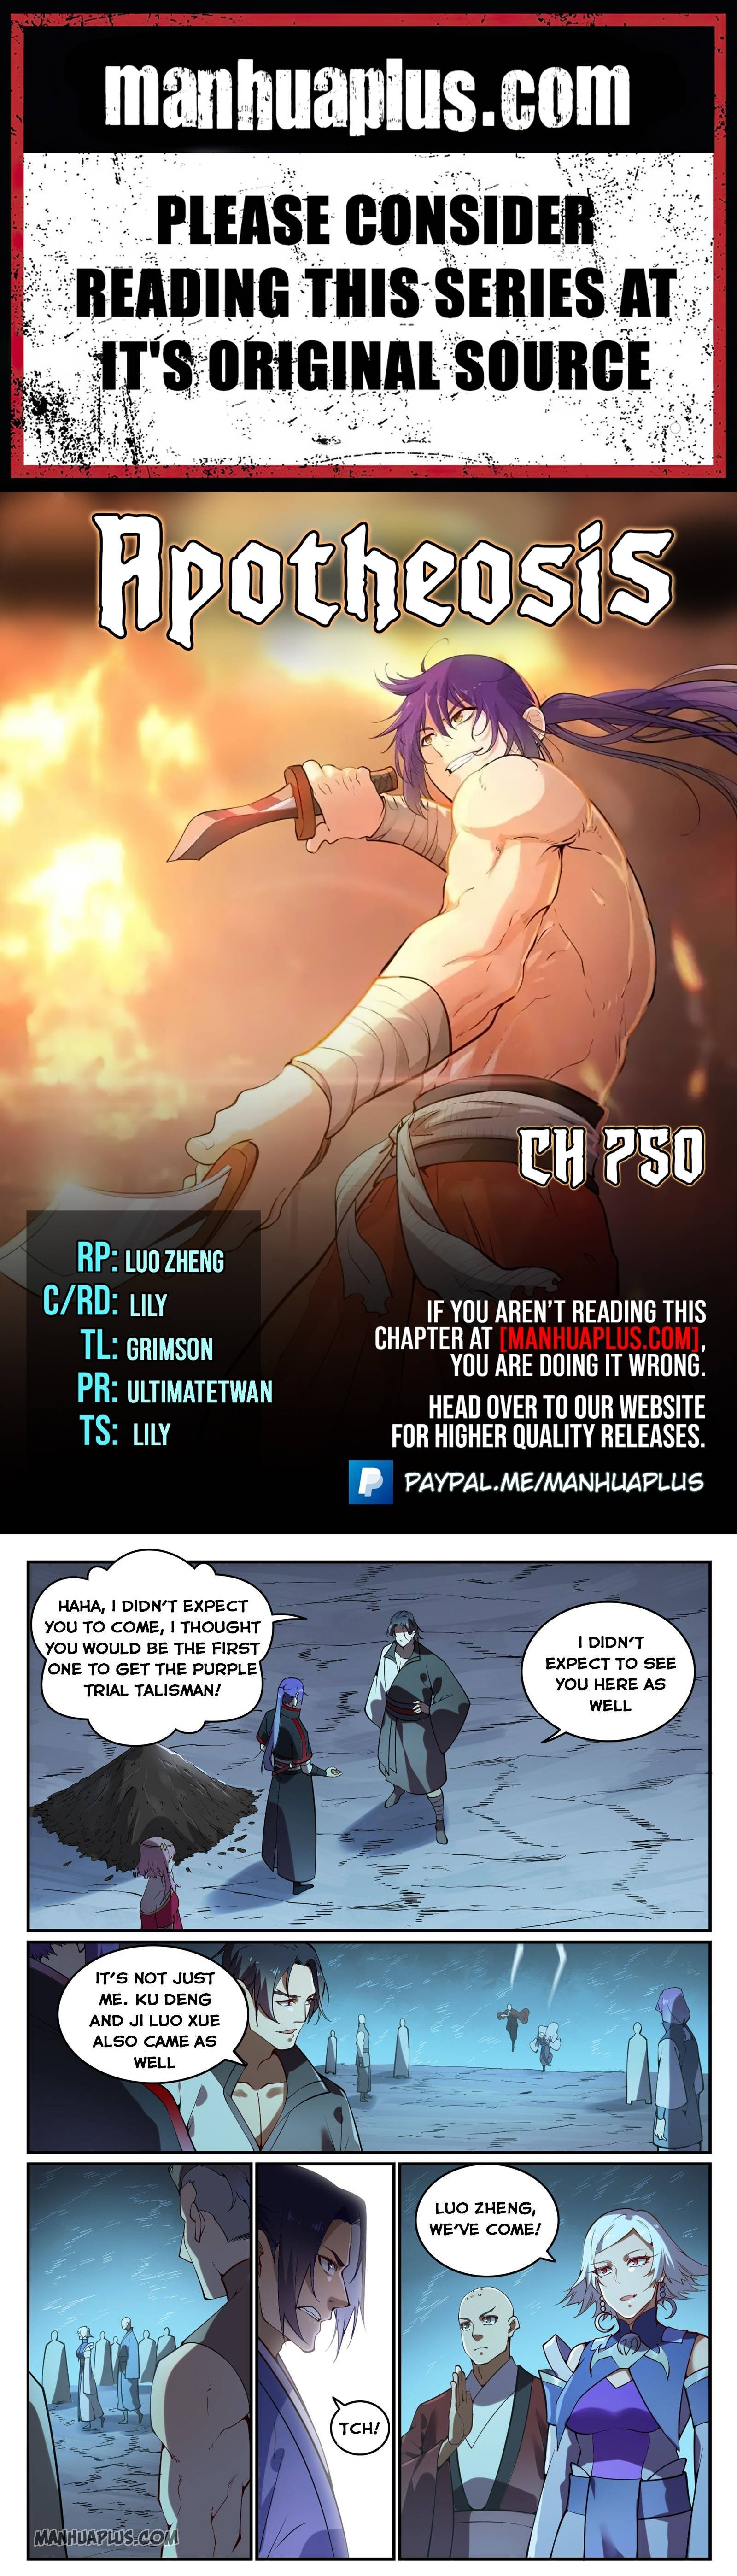 Manga Apotheosis - Chapter 750 Page 1